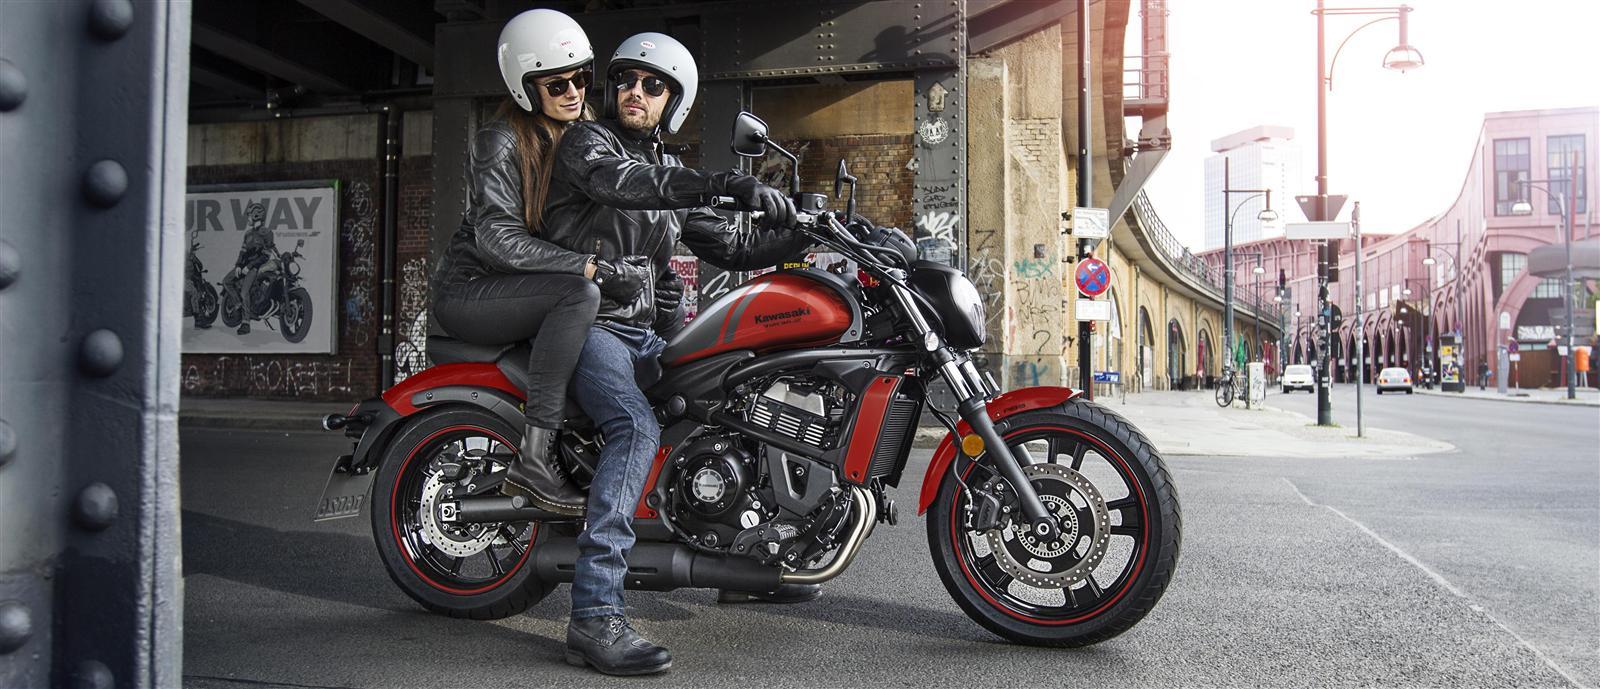 Moto del día: Kawasaki Vulcan S